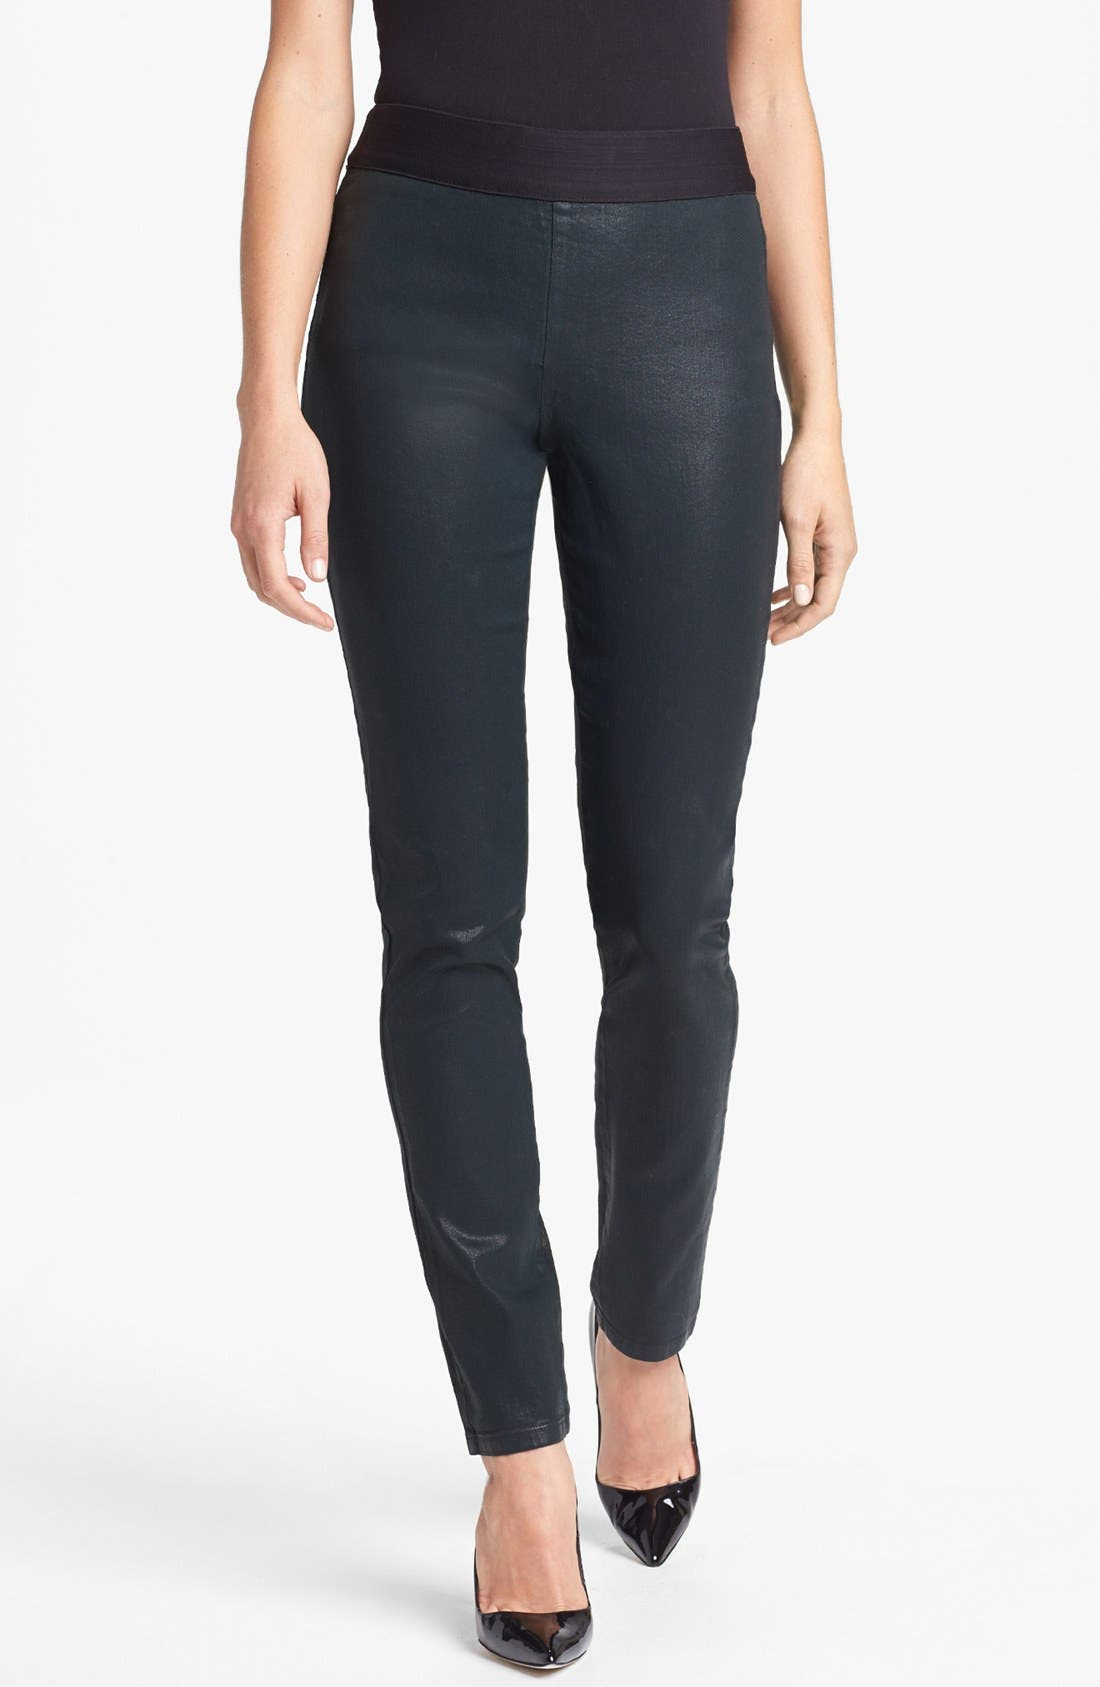 Main Image - NYDJ 'Gia' Coated Stretch Pull-On Pants